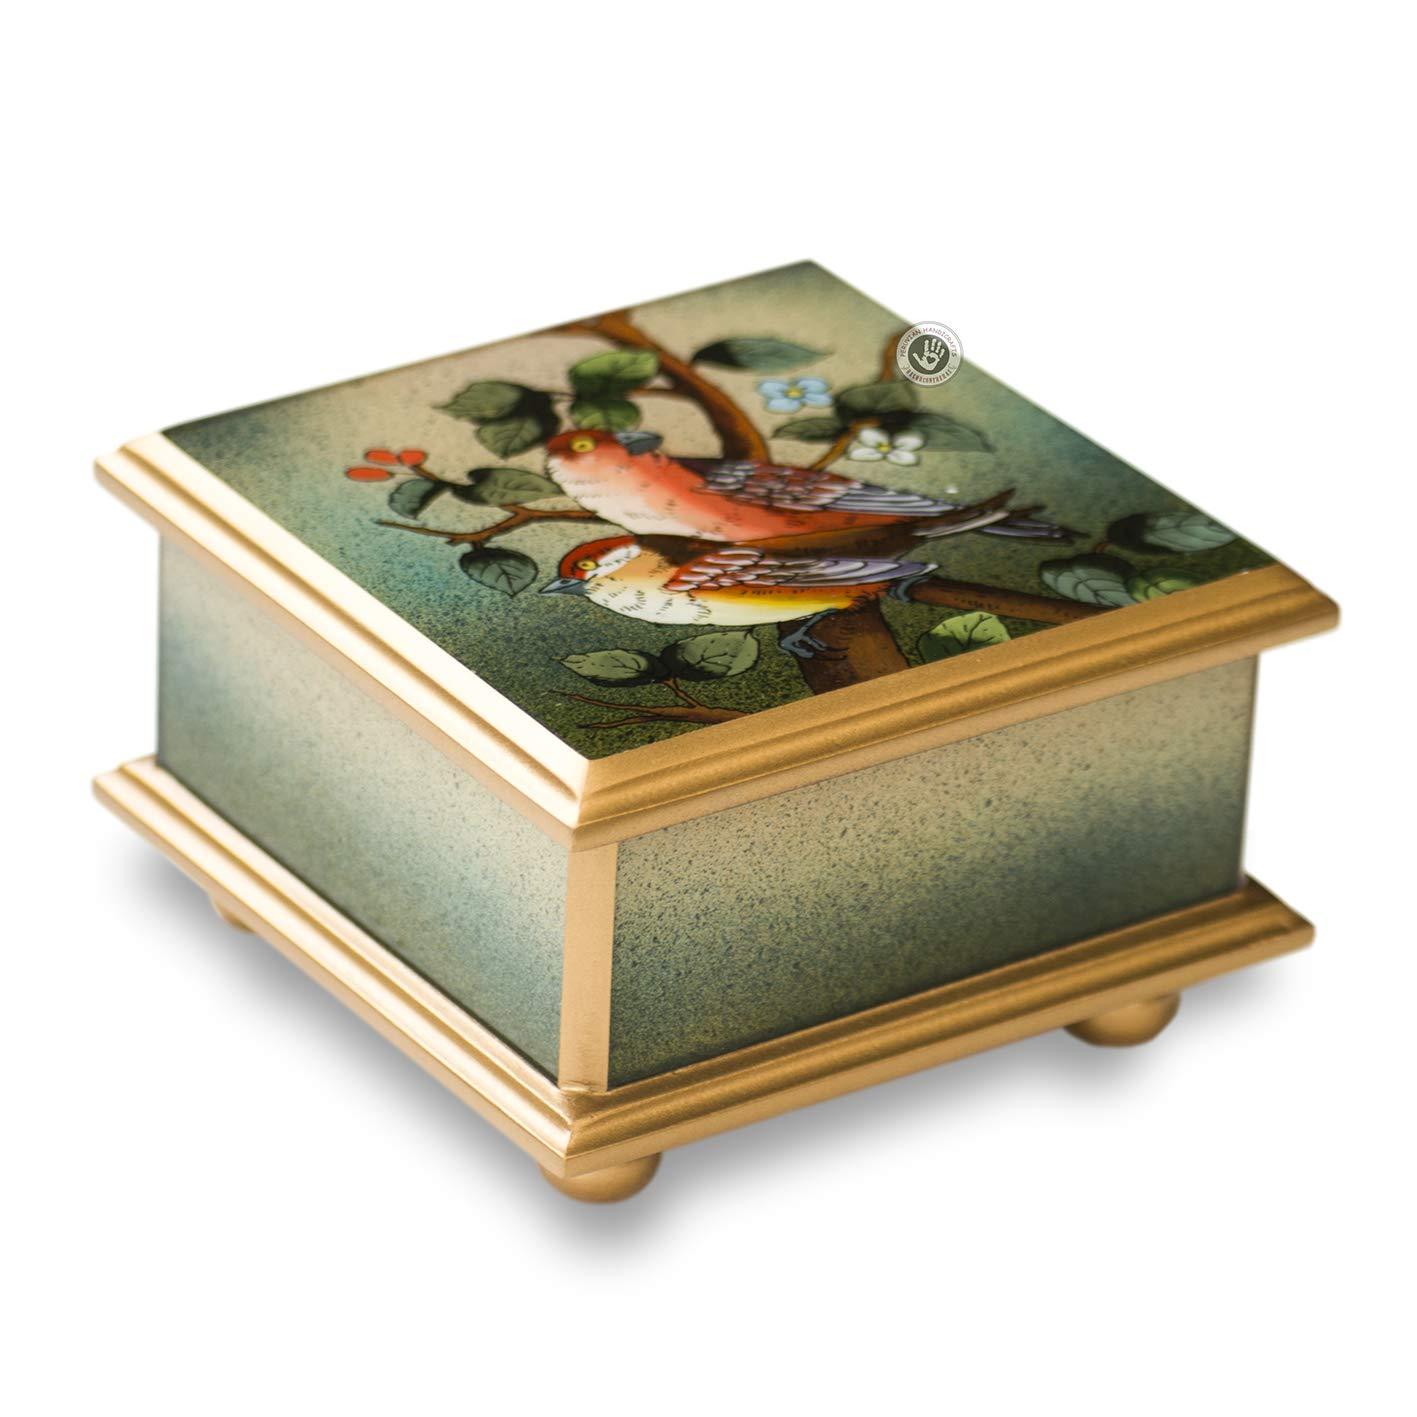 Peruvian glass Jewellery box, Handmade Jewellery box - Painted glass jewelery boxes, Peruvian handmade jewelry box, Gift for women, little birds' little birds'